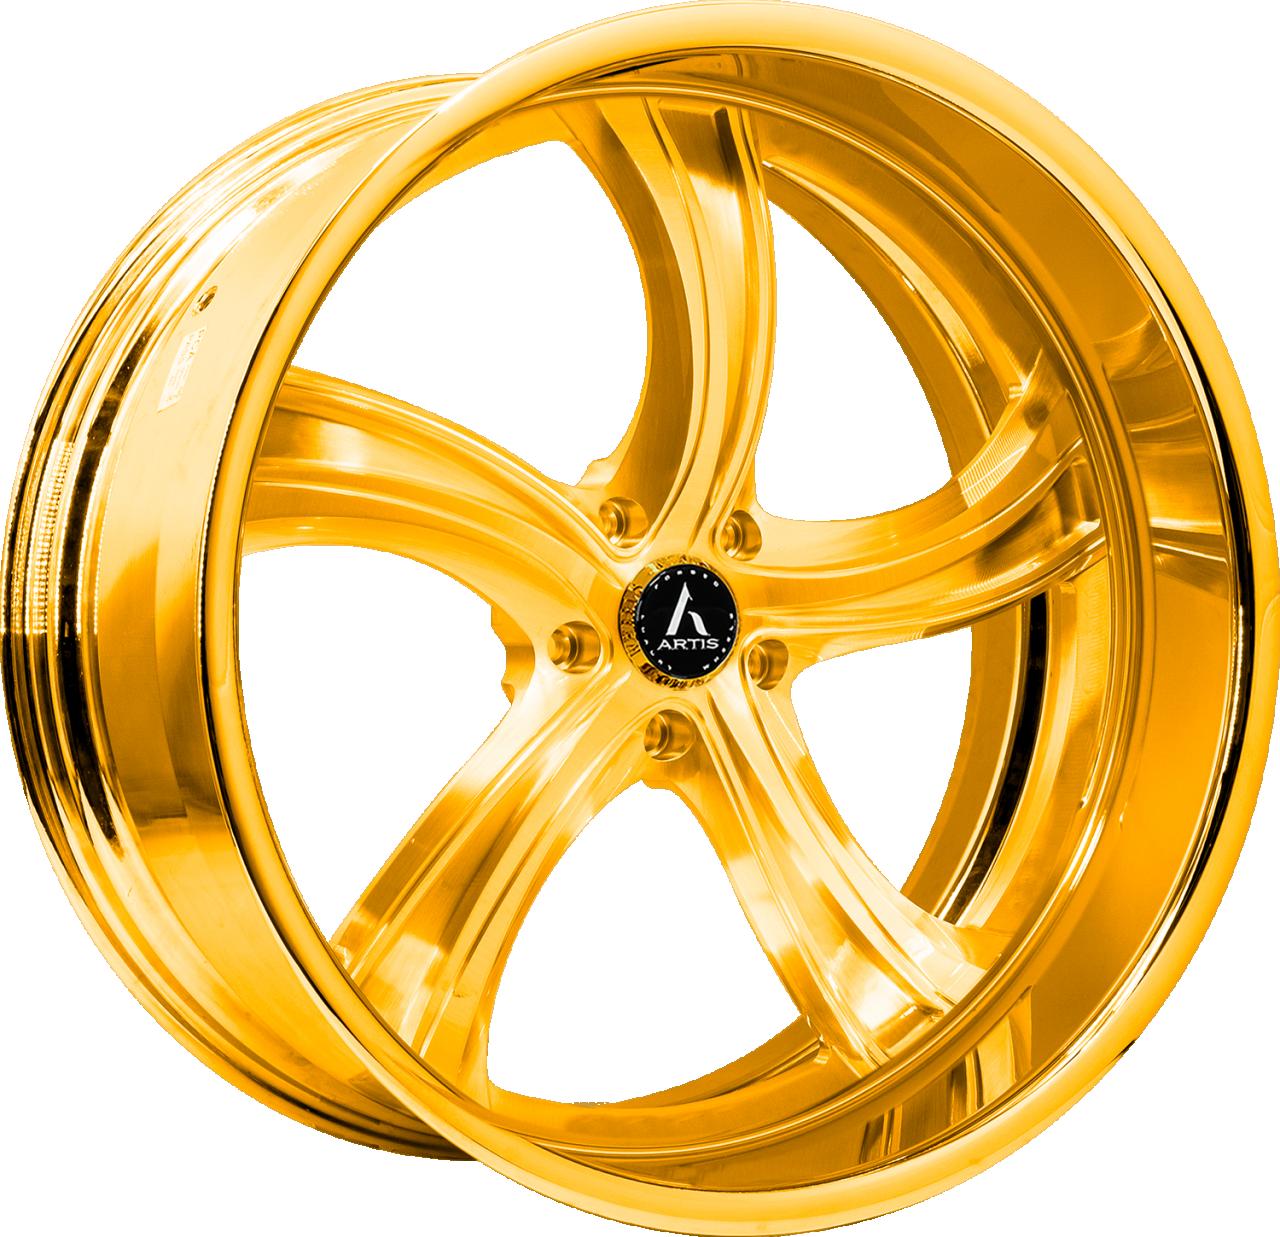 Artis Forged Kokomo-M wheel with Gold finish